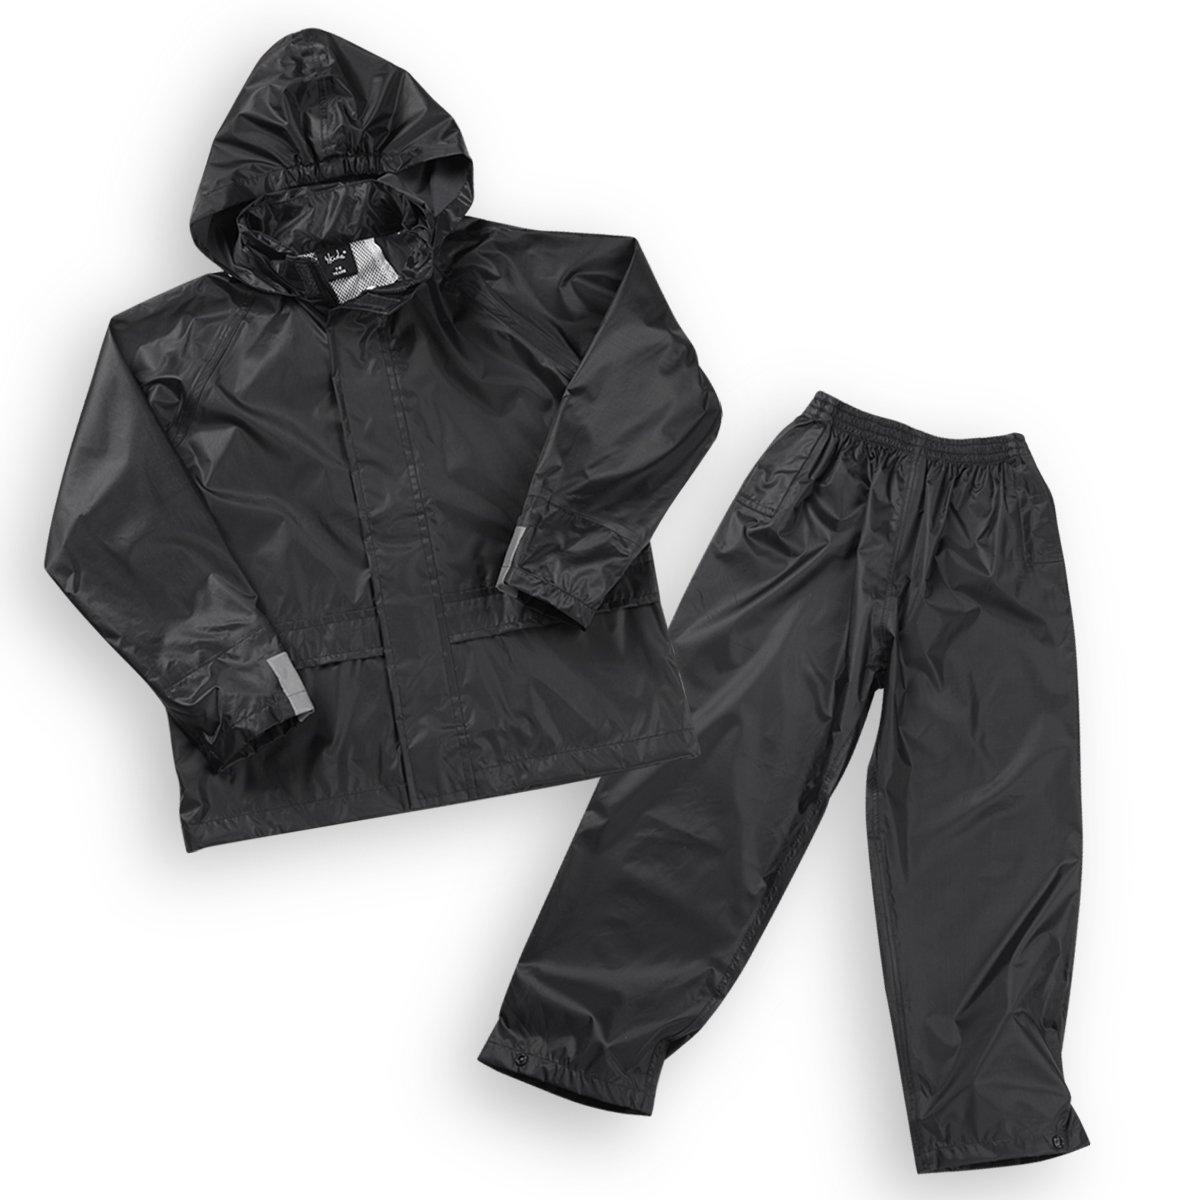 Kids Waterproof Jacket and Trouser Set Baum Trading